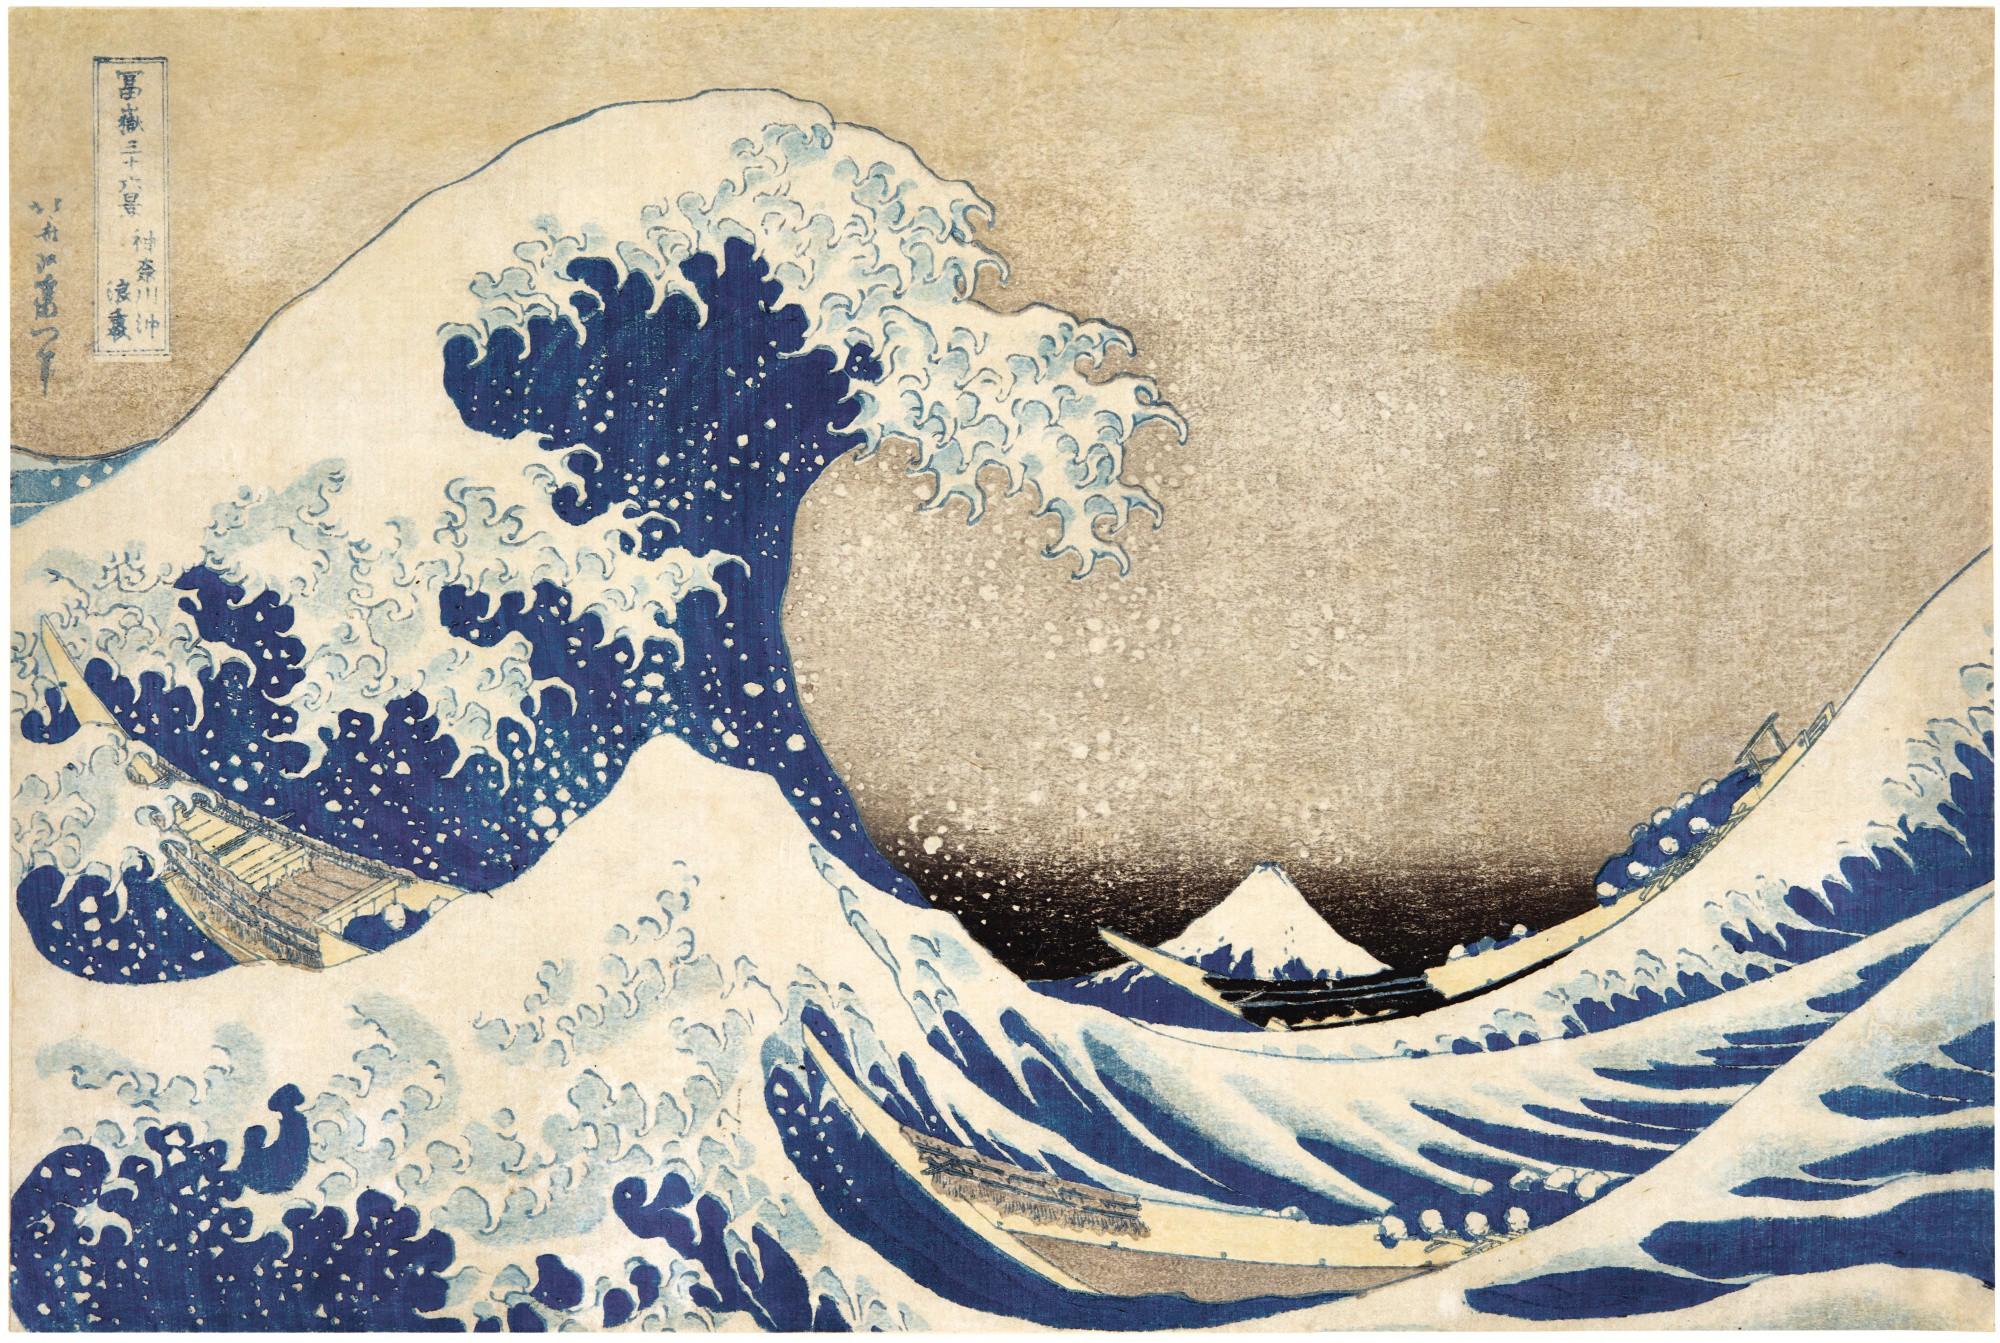 KATSUSHIKA HOKUSAI (1760-1849), EDO PERIOD, 19TH CENTURY ...